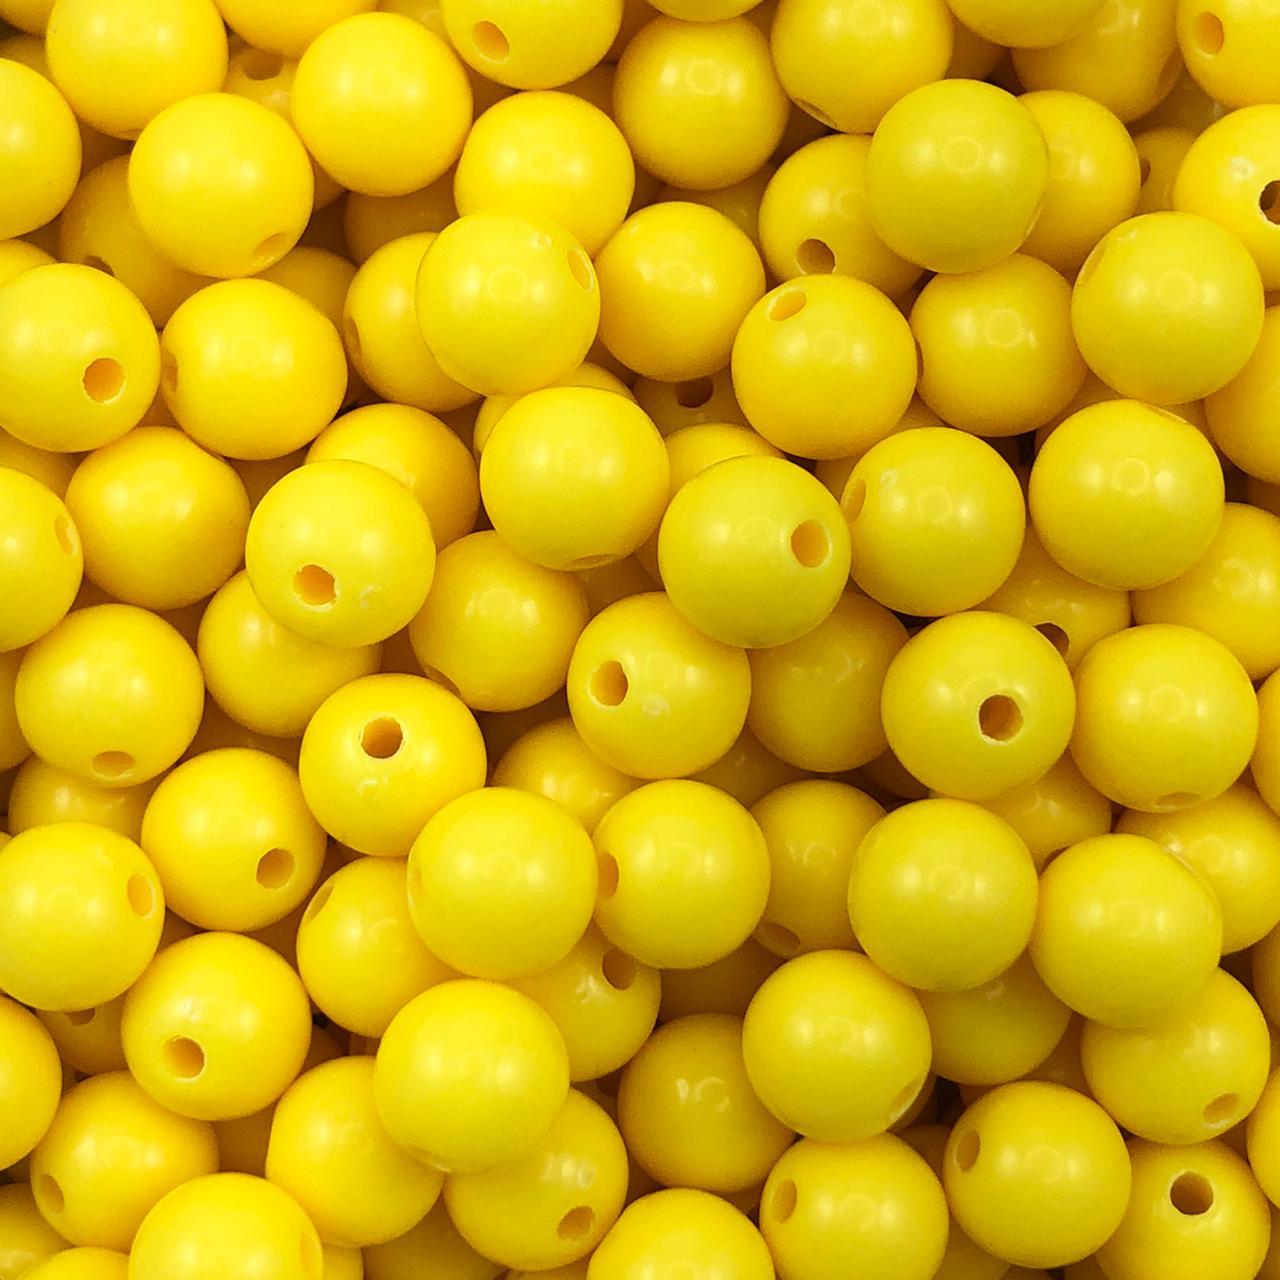 BOL660- Bola Plástica Amarelo 8mm - 20Grs